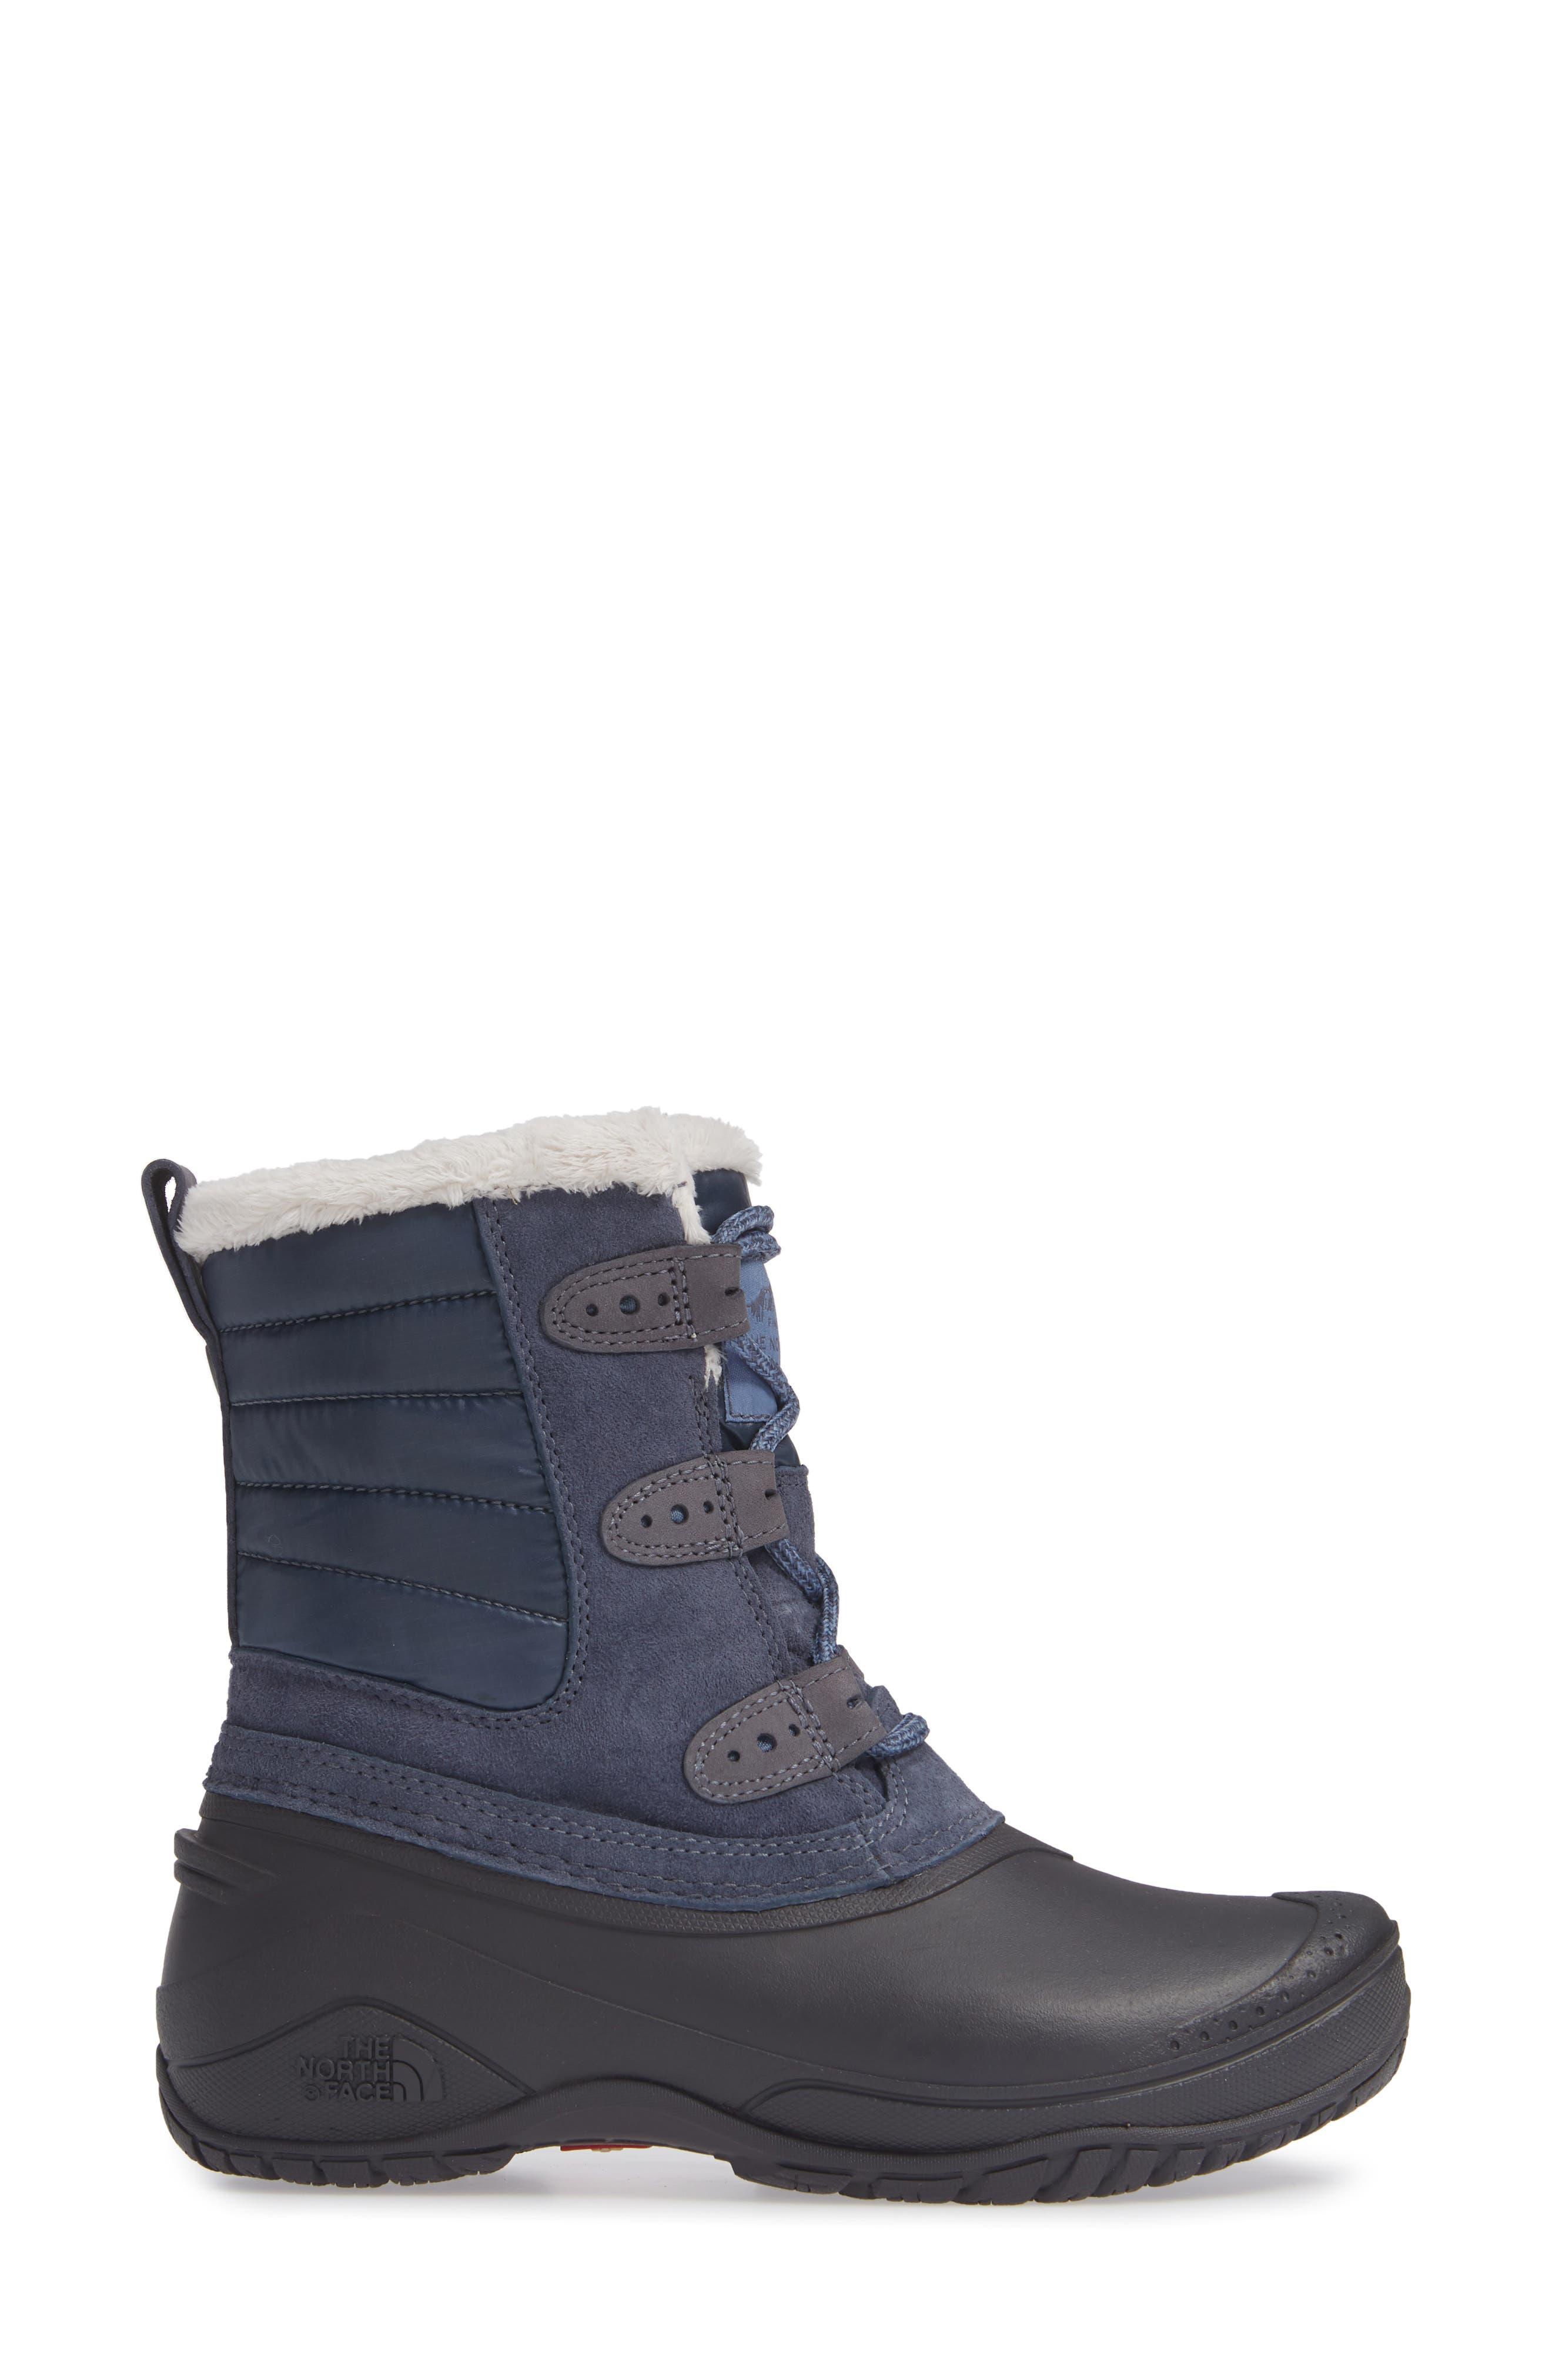 Shellista II Waterproof Boot,                             Alternate thumbnail 16, color,